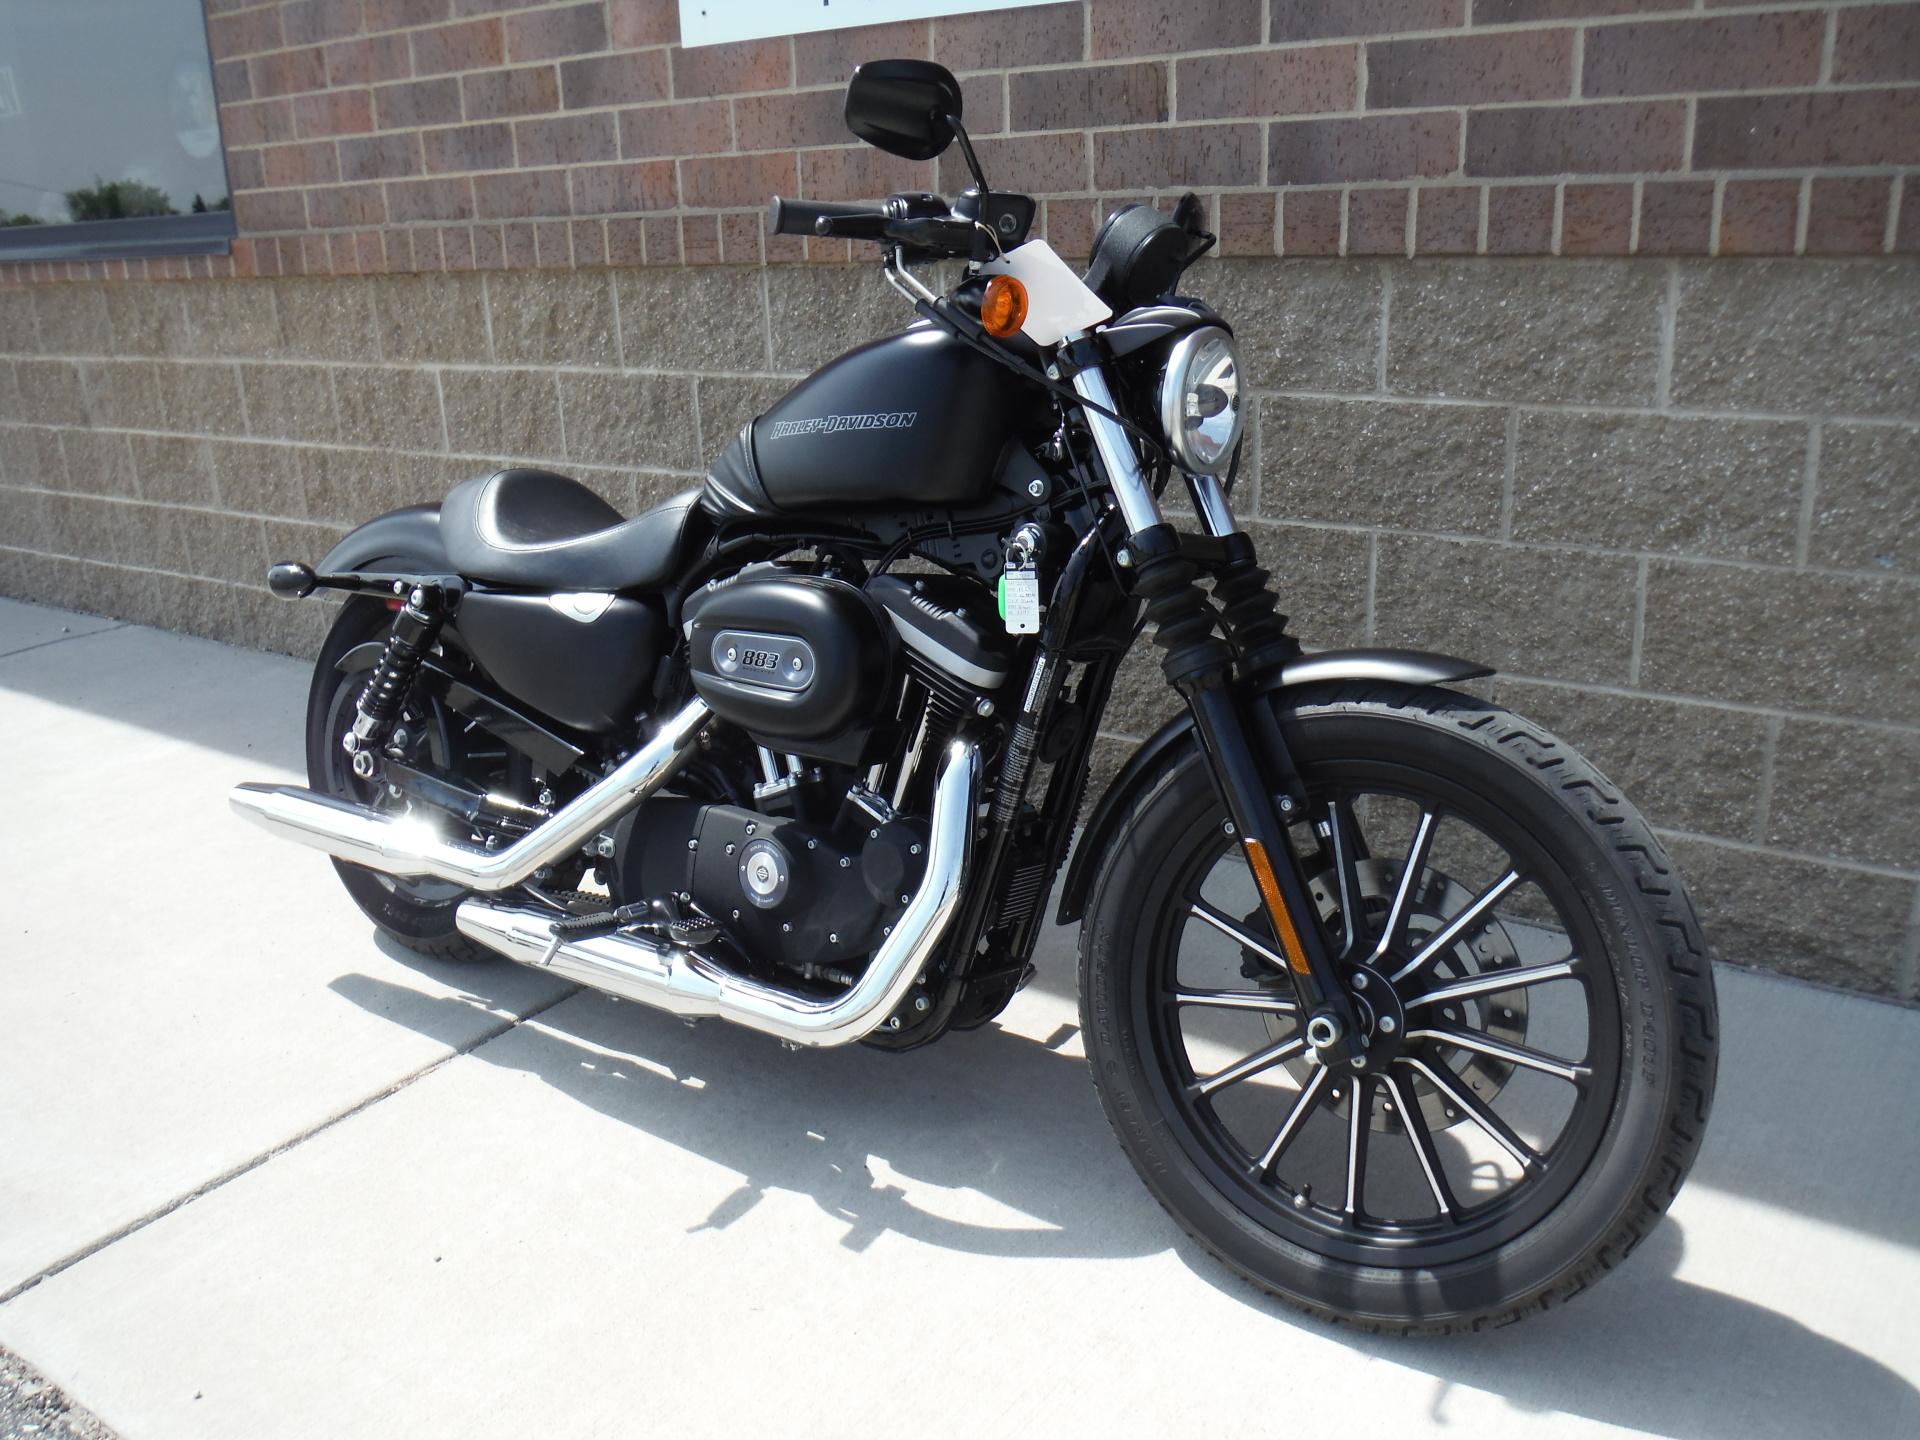 2010 Harley Davidson XL883N Iron